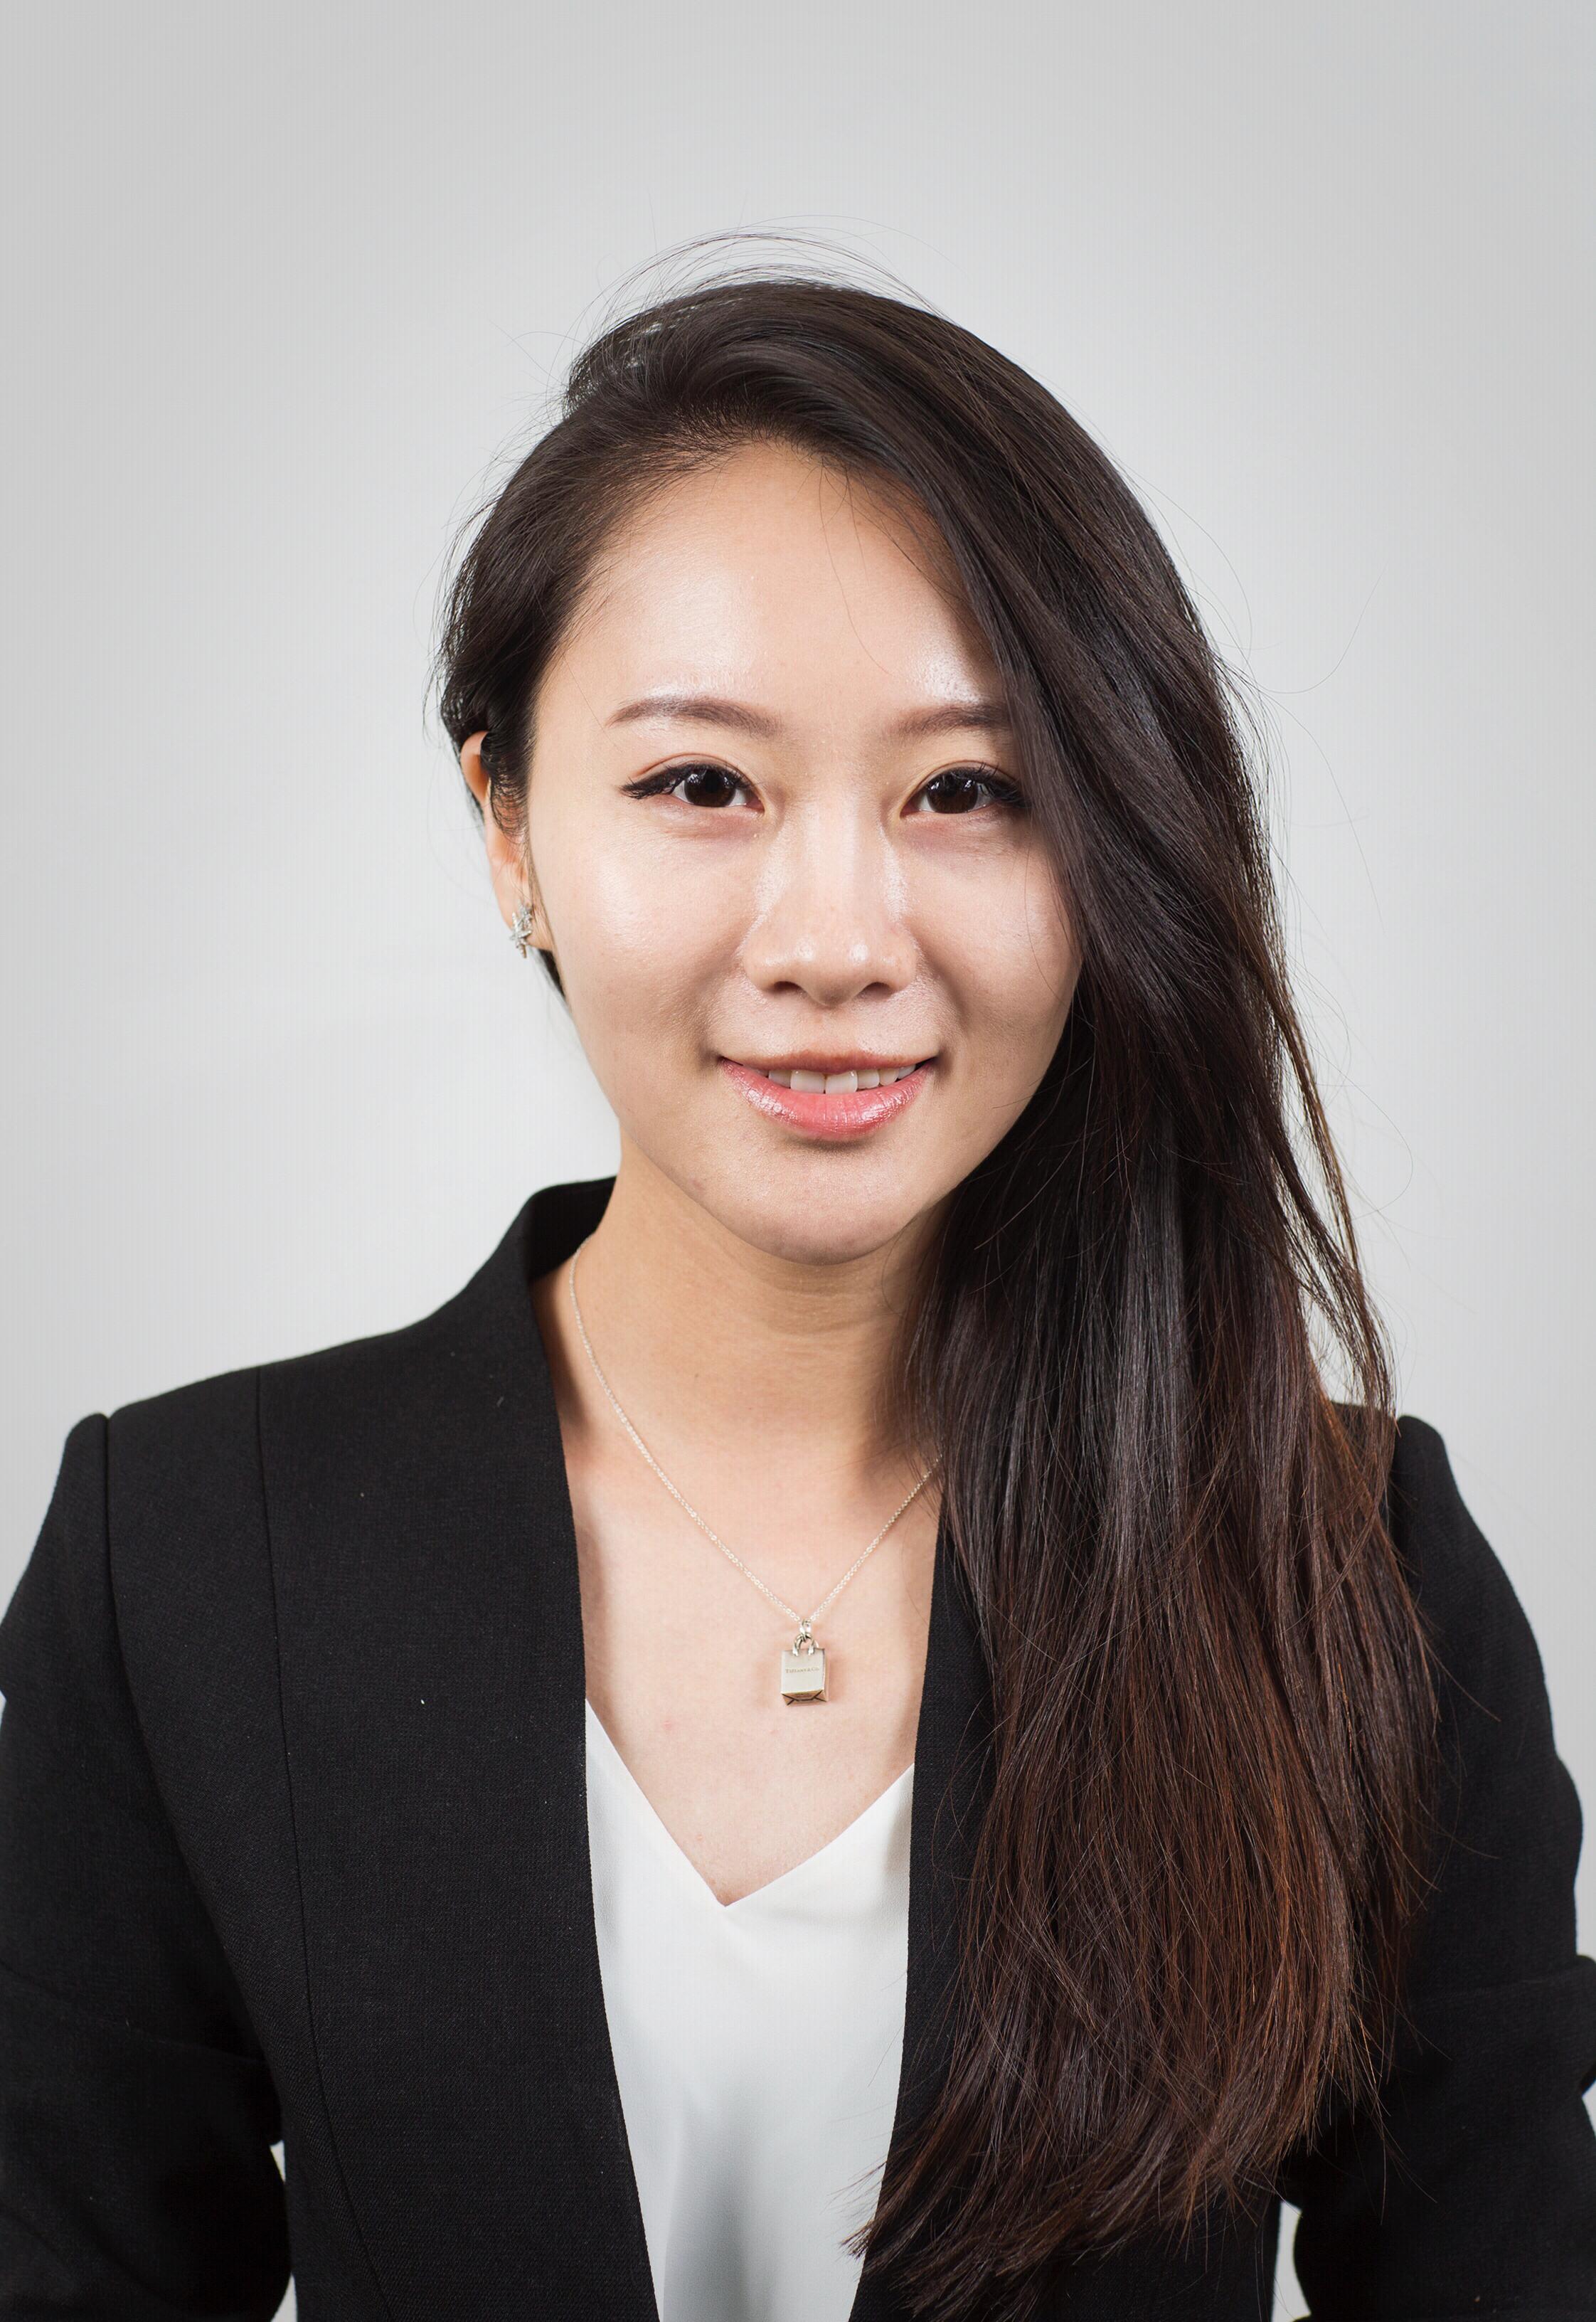 IMG_5903 - Mia Hong.JPG